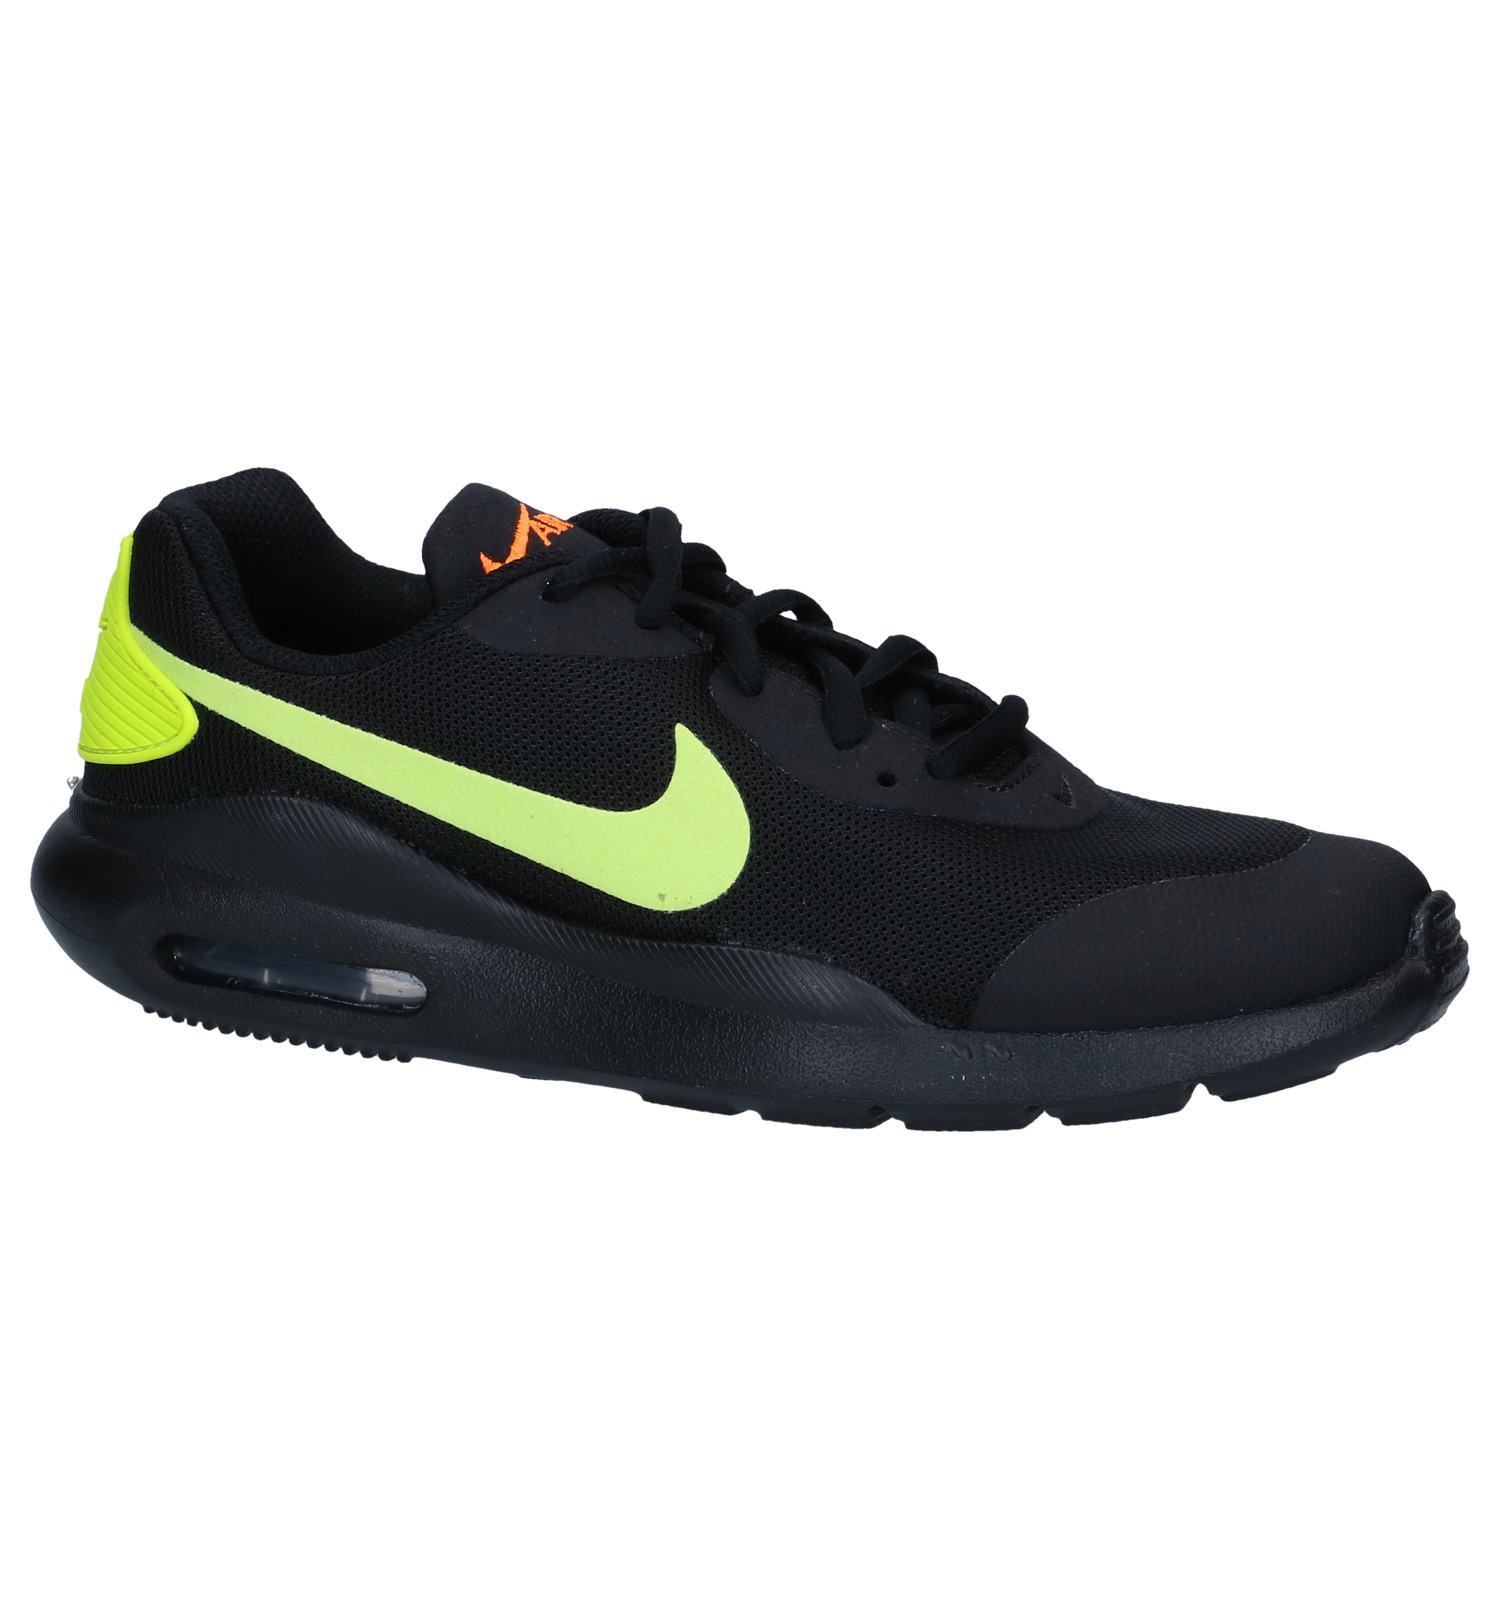 ef3546e7bbf Zwarte Runners Nike Air Max Oketo GS | TORFS.BE | Gratis verzend en retour